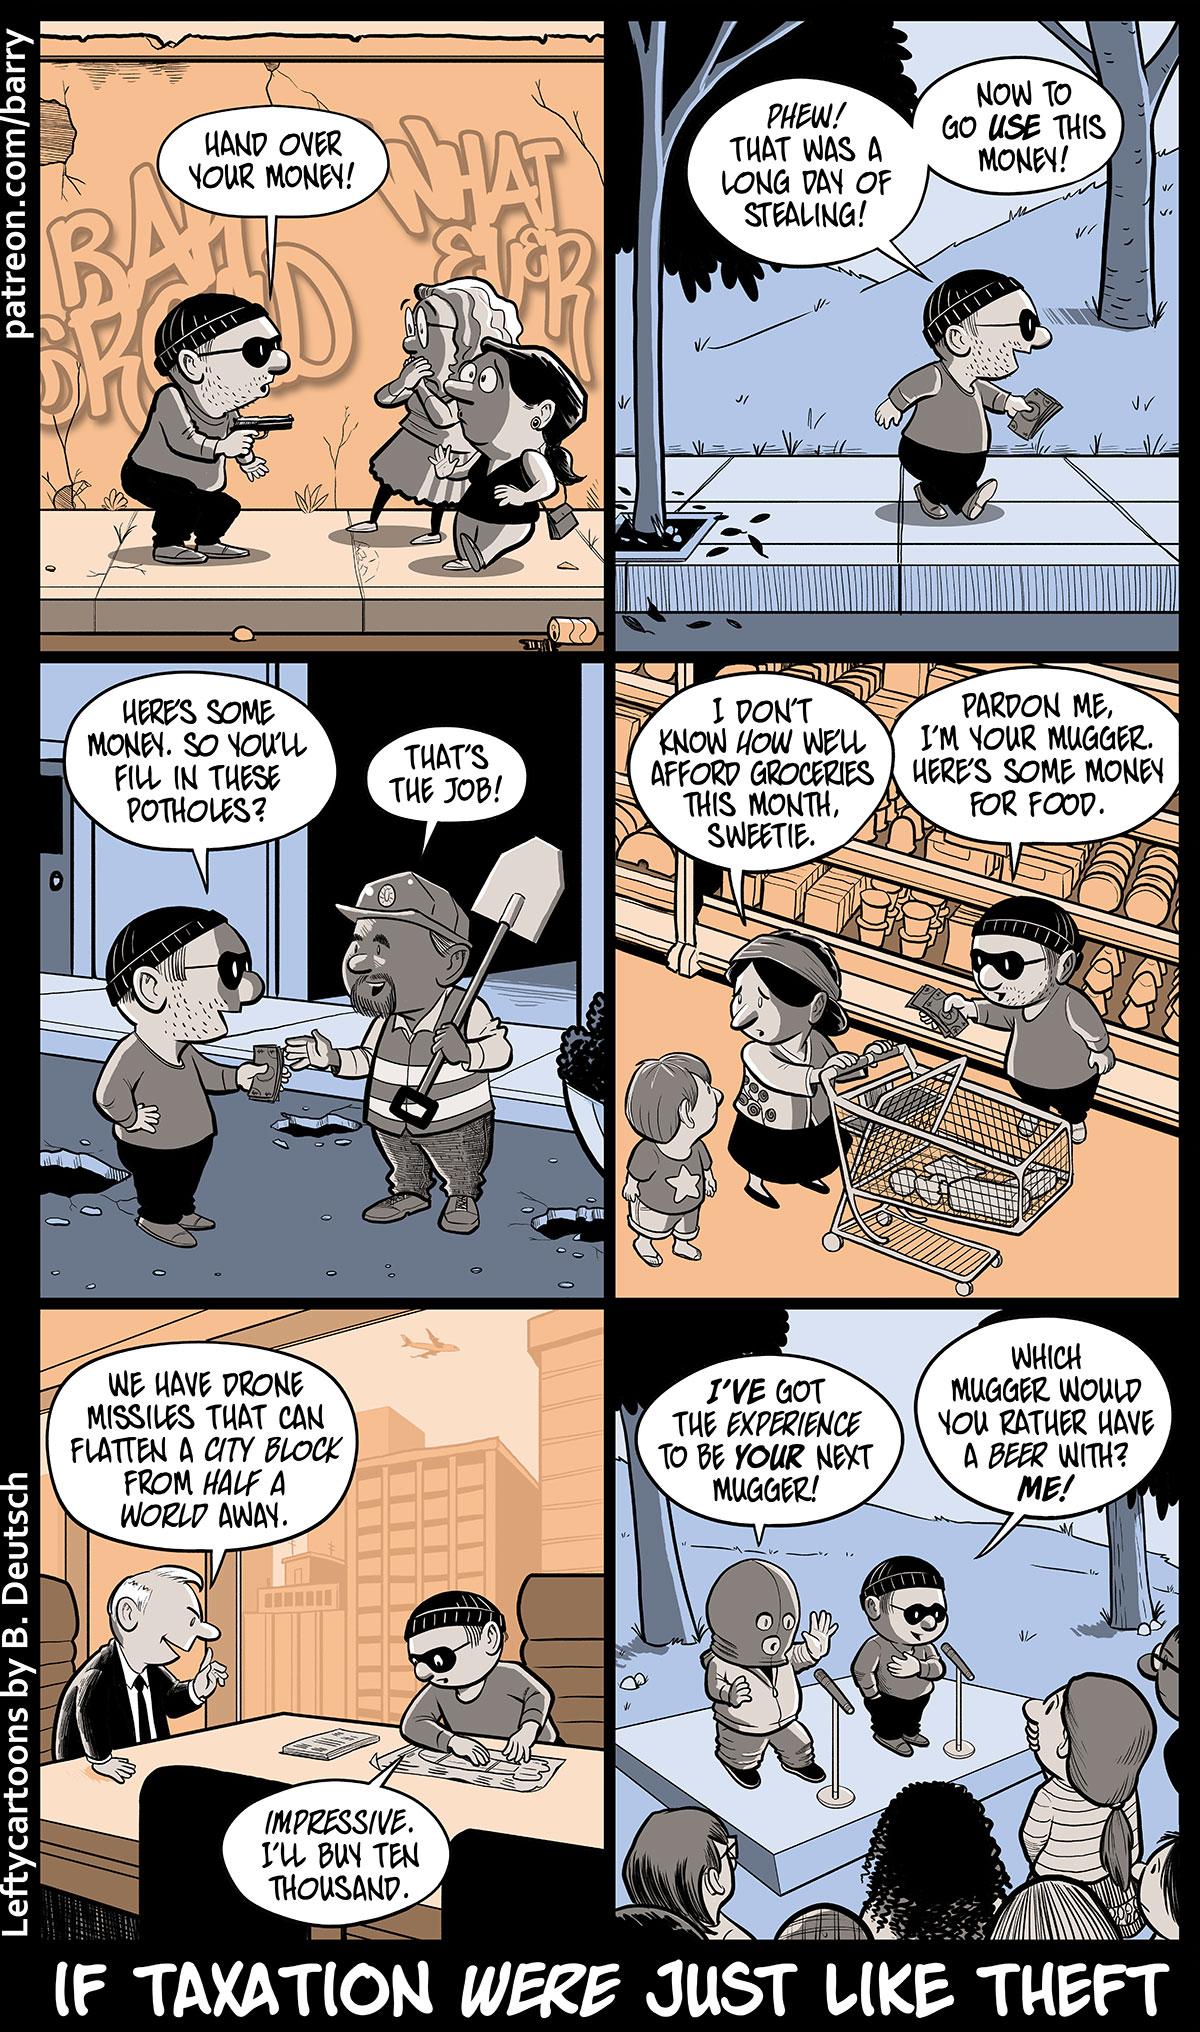 taxation-taxes-theft-mugger-alt-layout.j